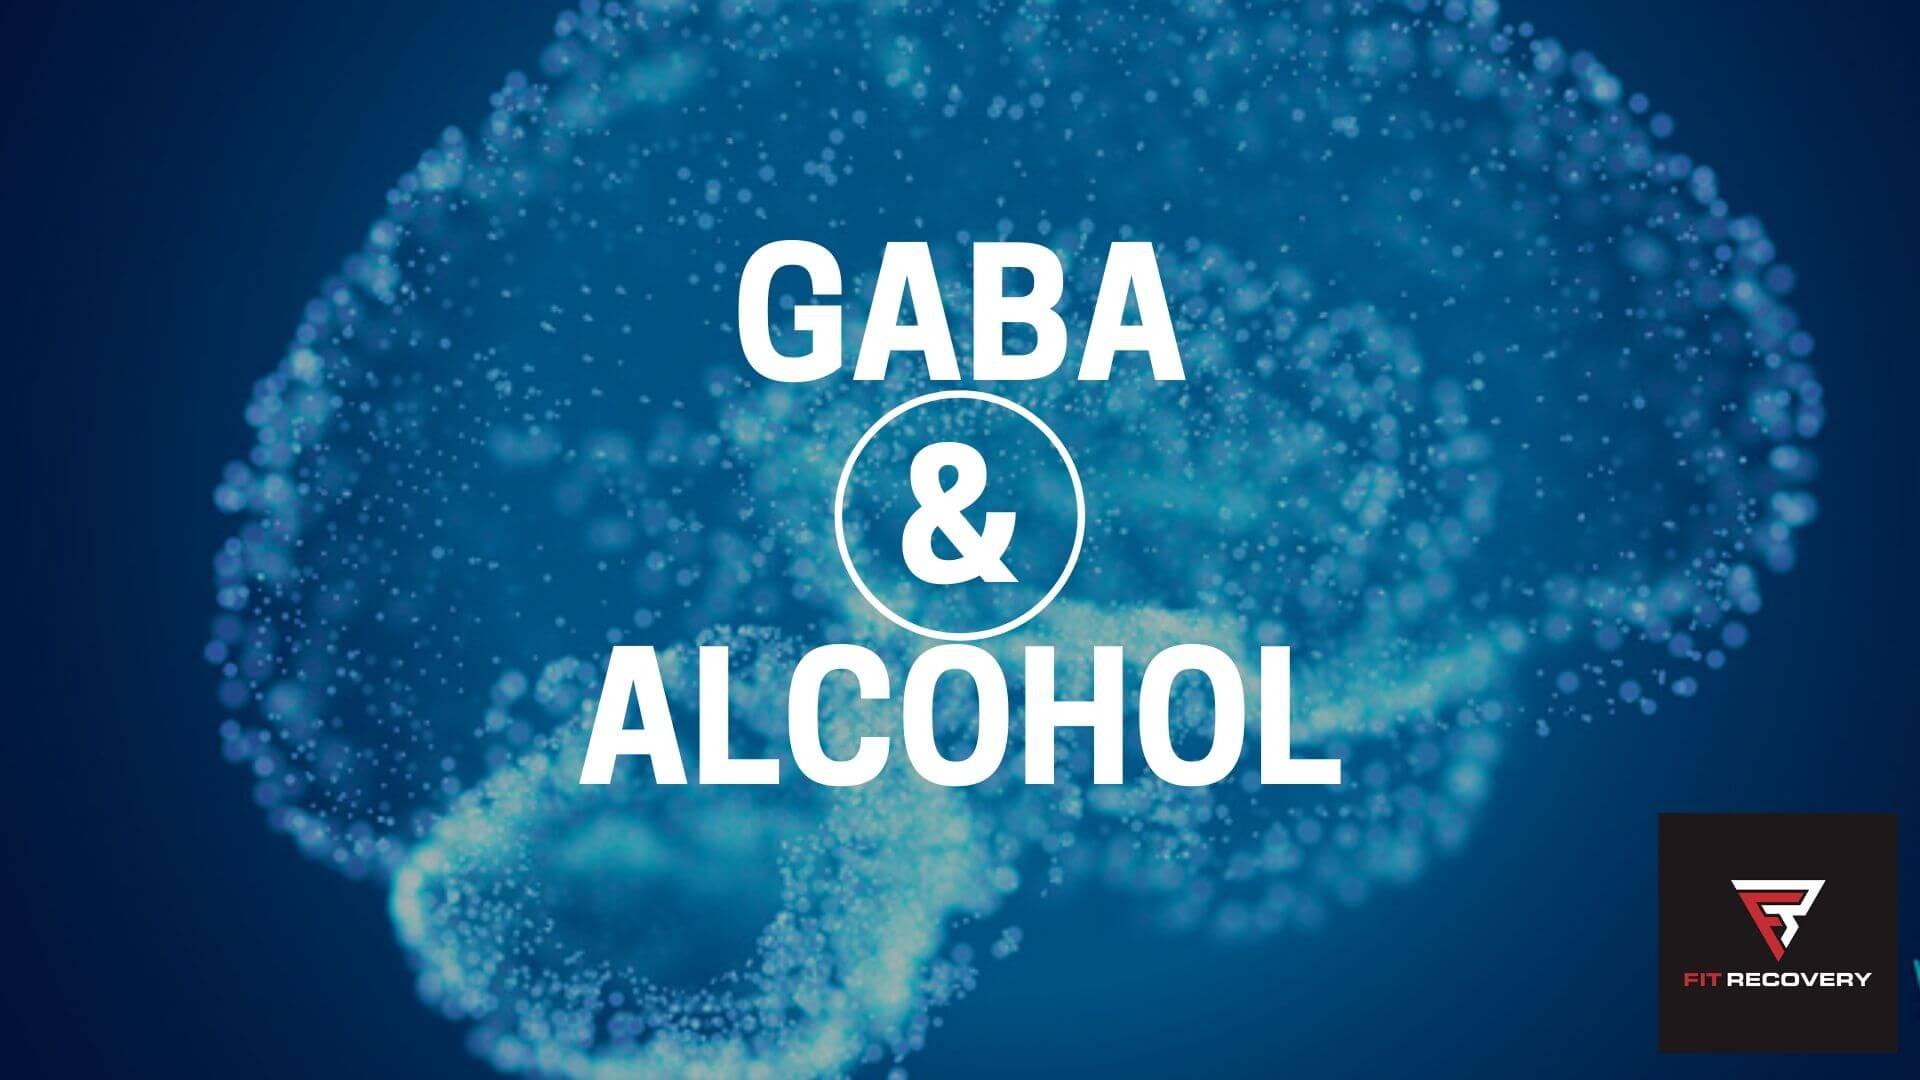 Gaba and alcohol